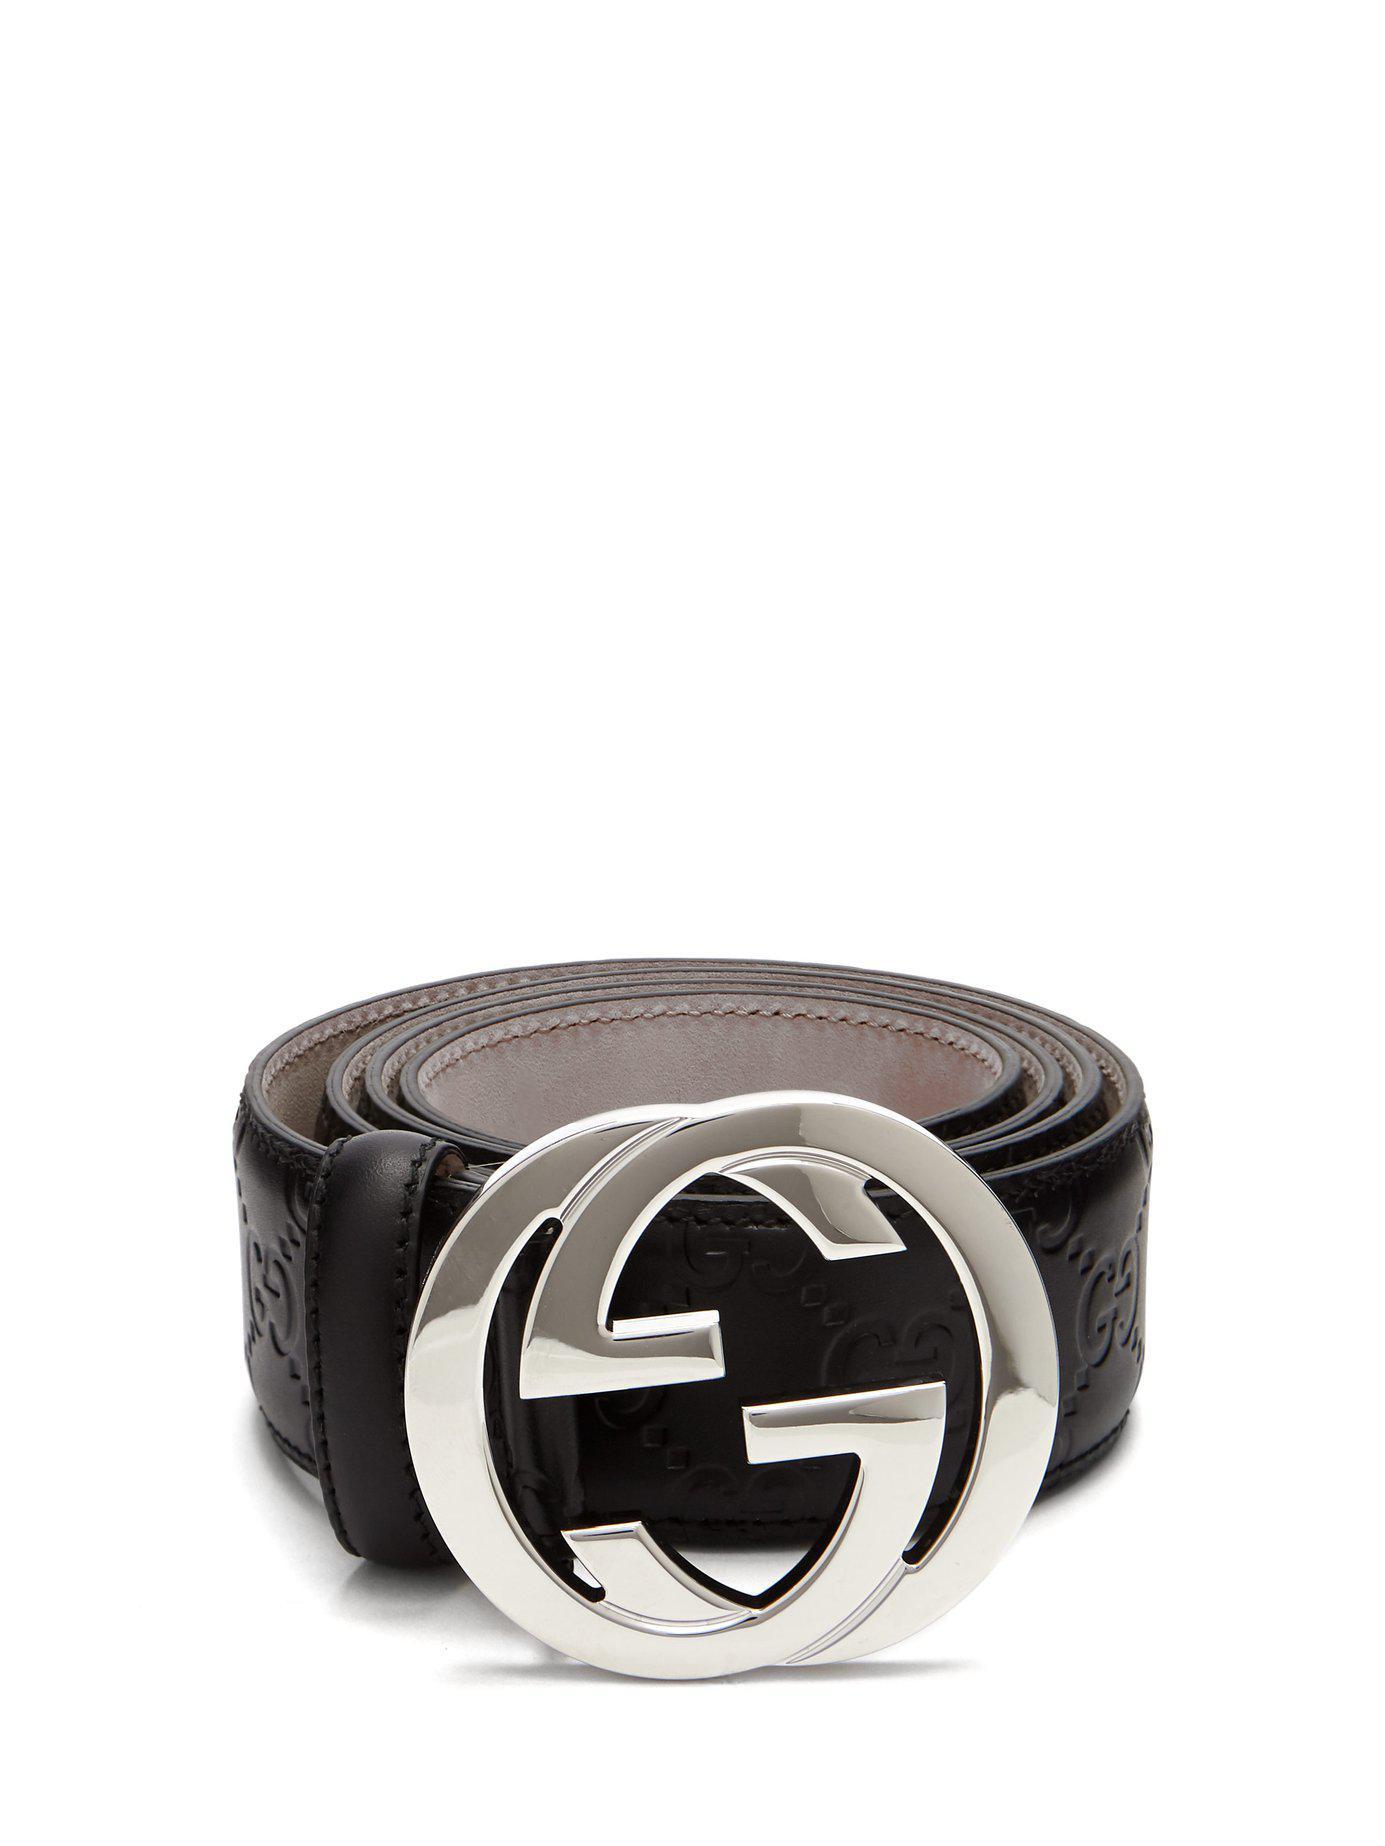 Lyst - Gucci Signature Gg Logo Leather Belt in Black for Men 426a5e58cc1f